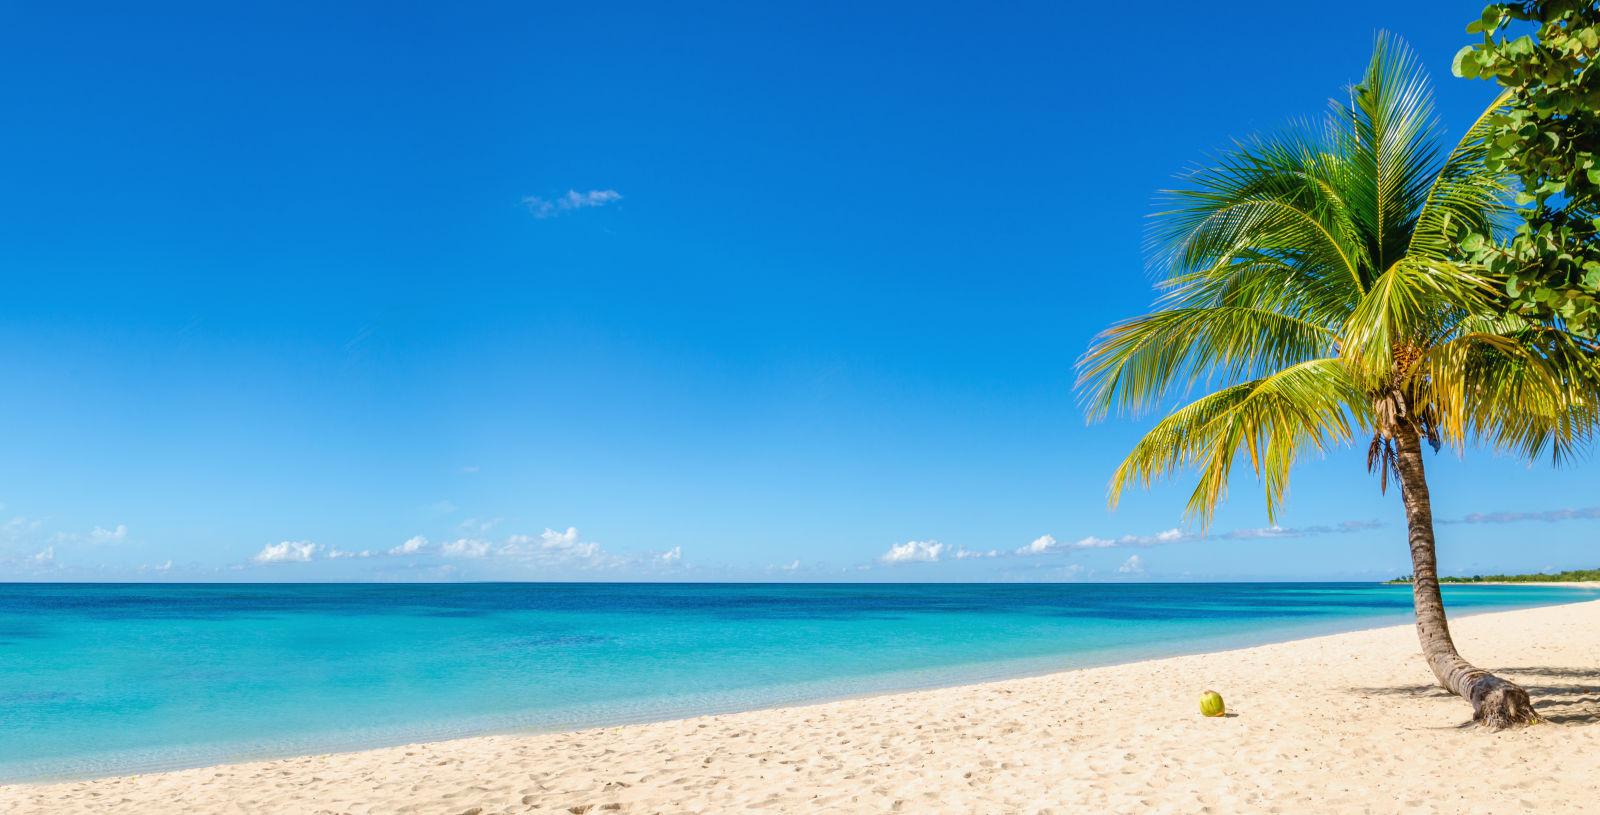 vacationshub-beach